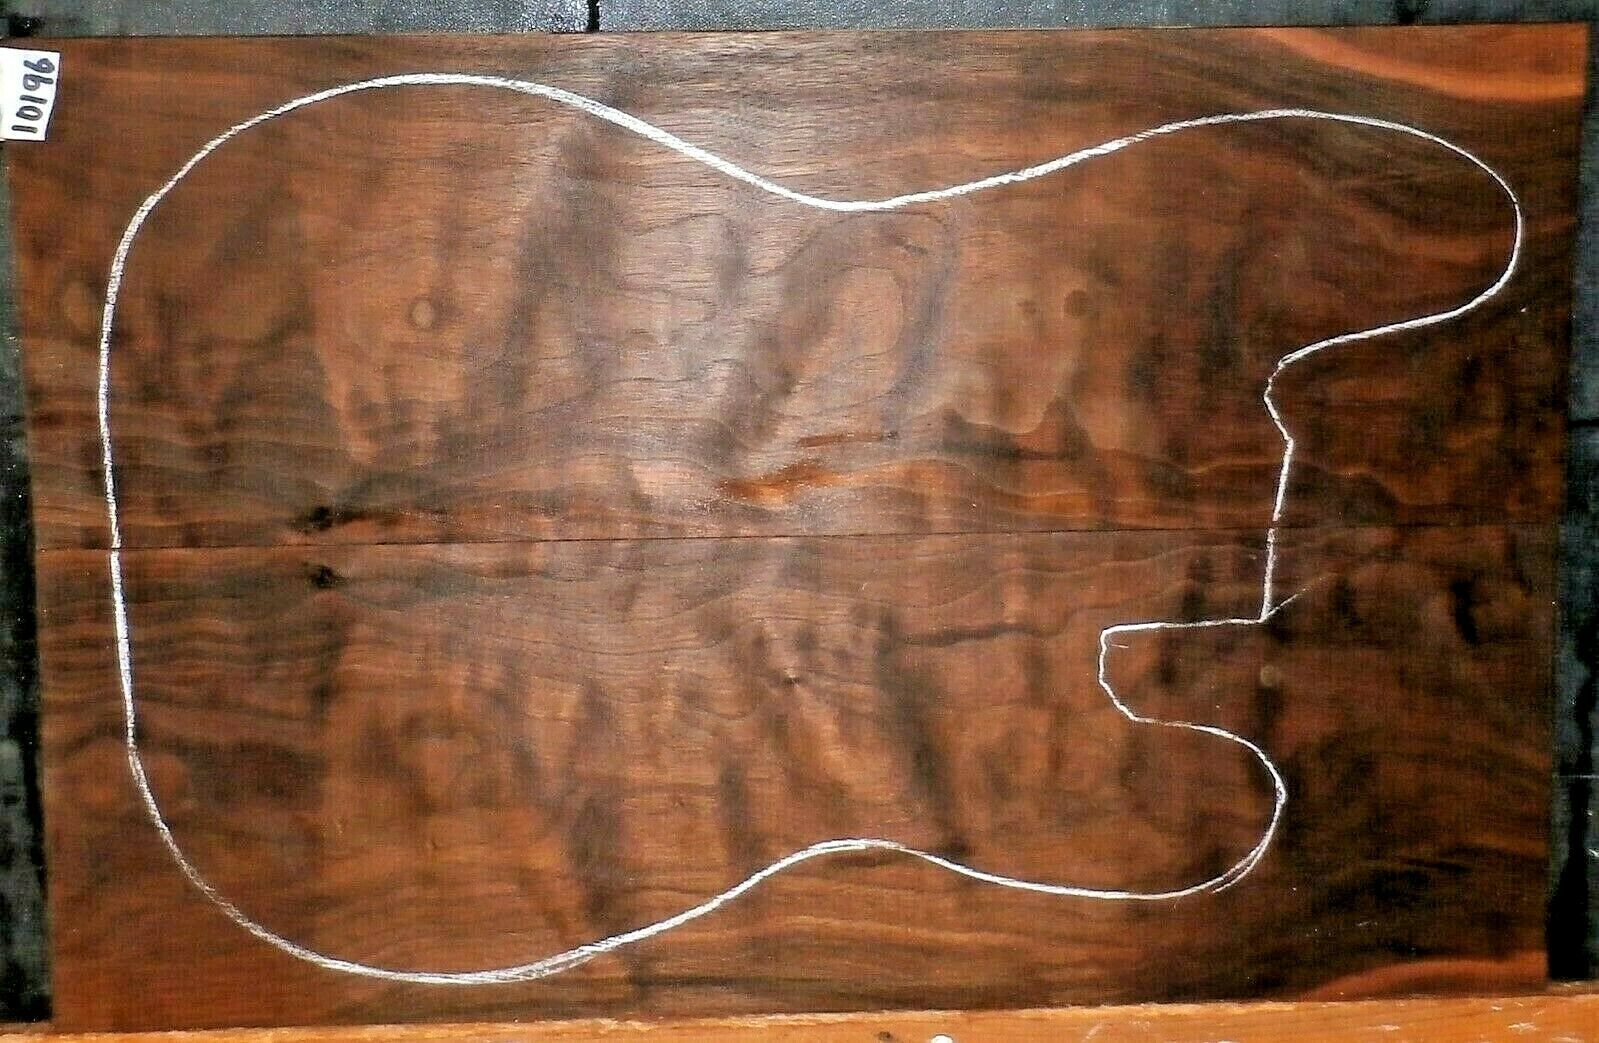 Quiltes Claro Walnussholz 10196 Luthier 5A Grade Guitar Top Set 22x 14.75x.375